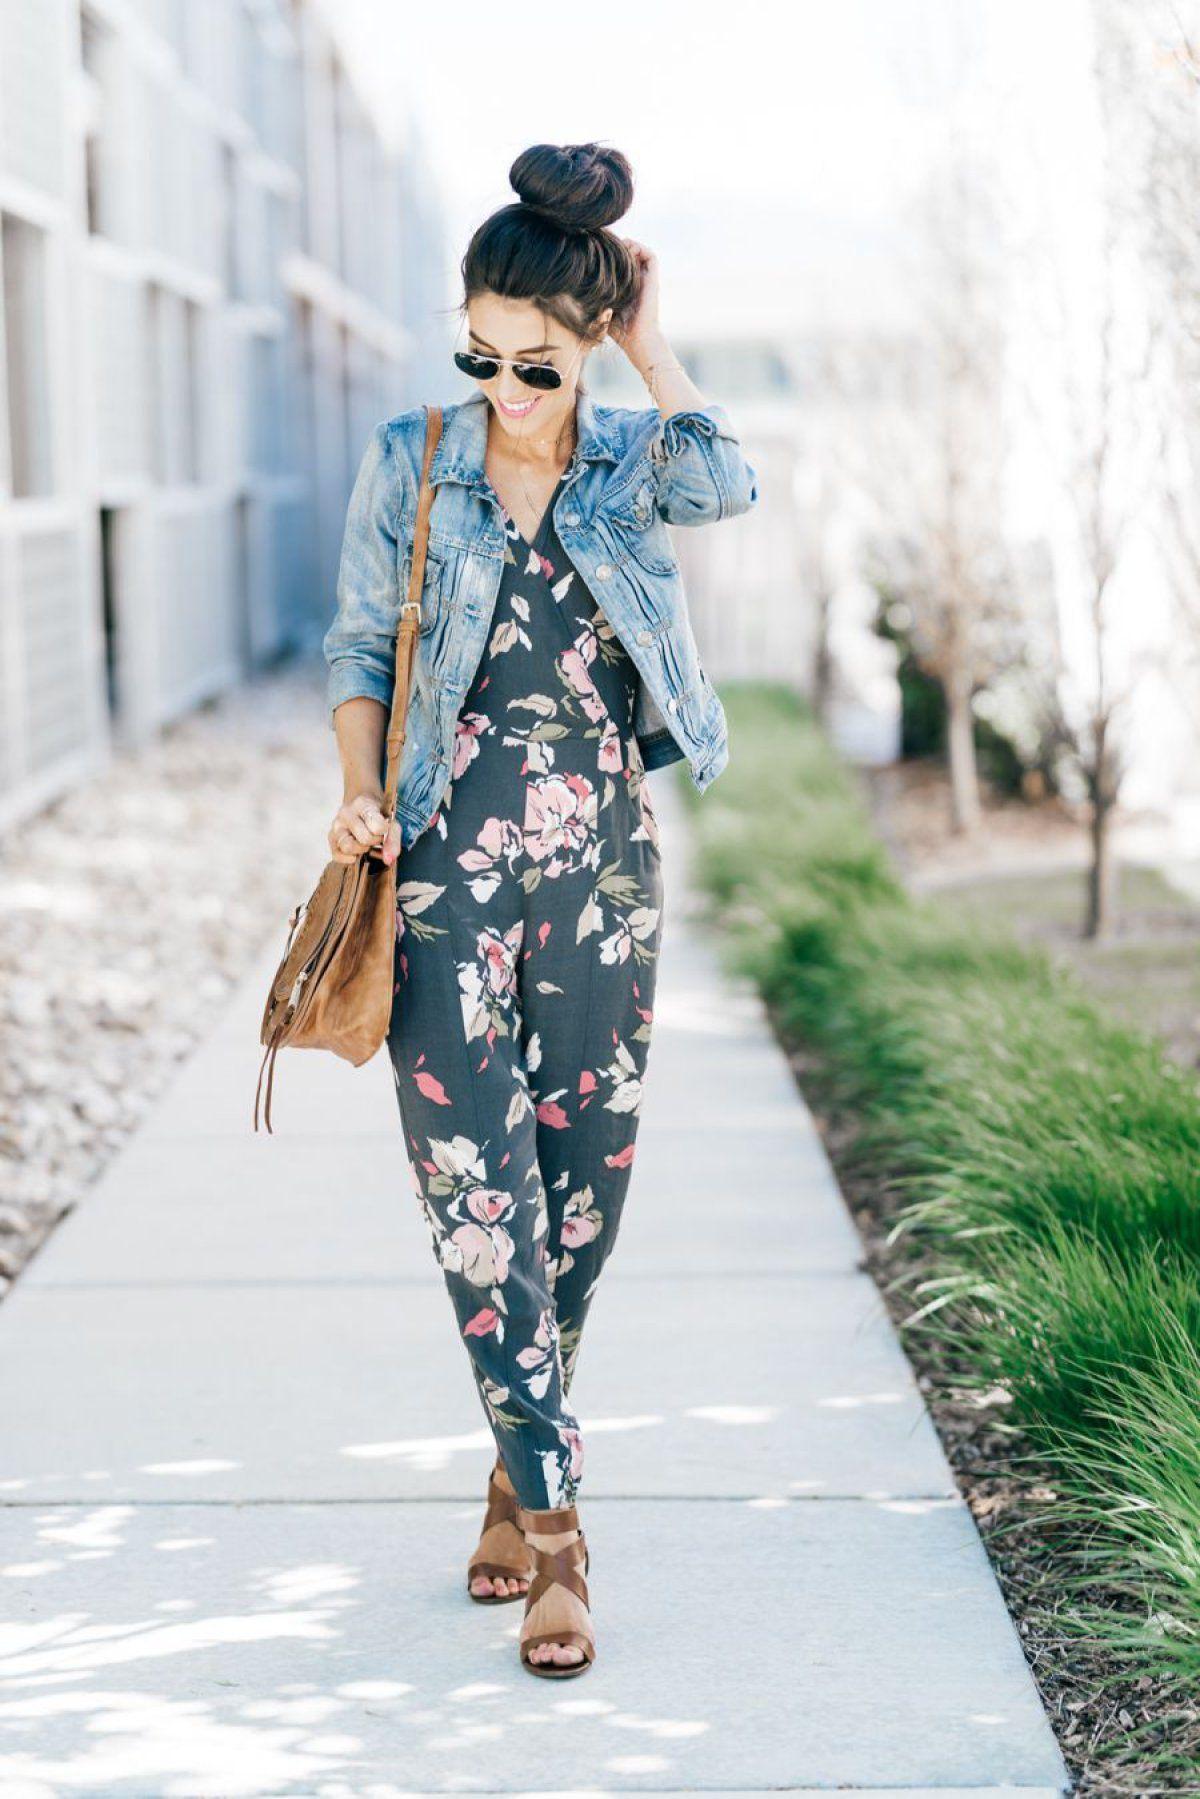 Outfits Primavera 2019 Búsqueda De Google Trajes Casuales Outfits Outfits Casuales